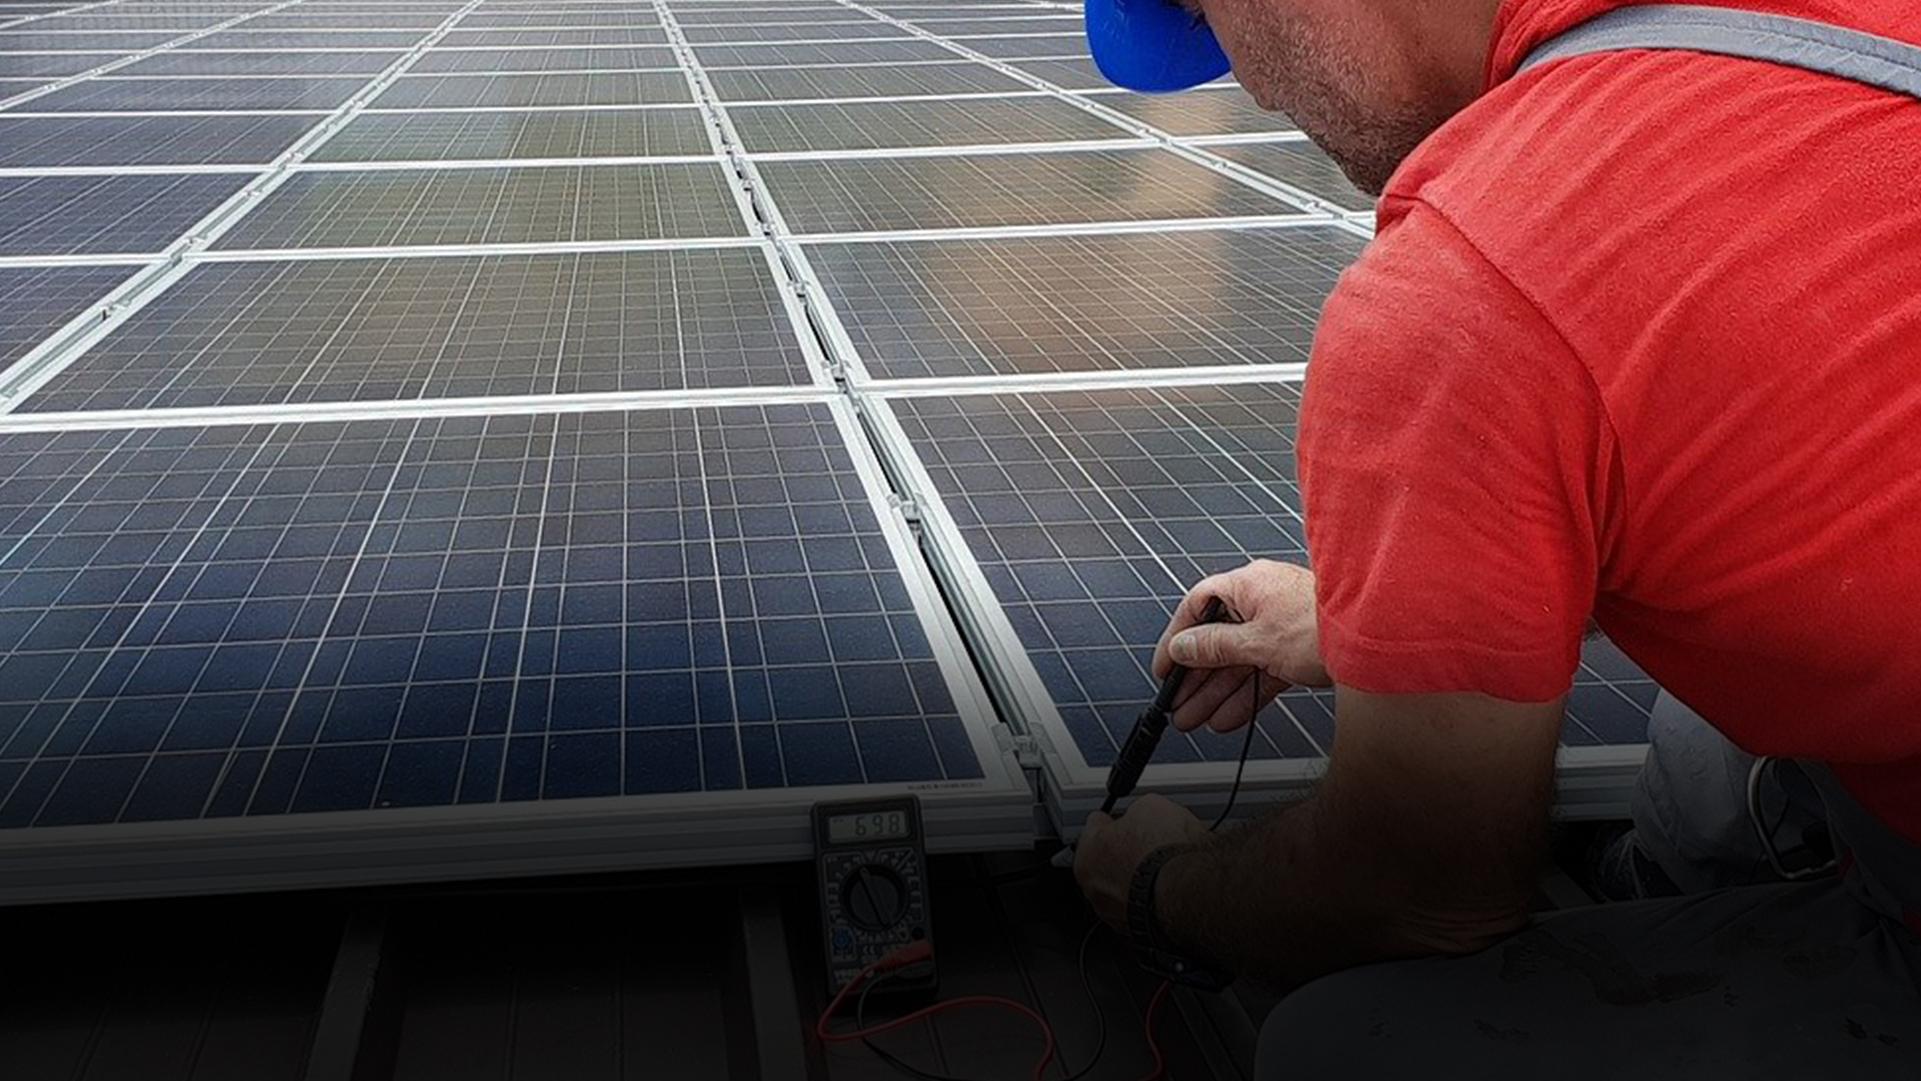 Photovoltaics - green energy!